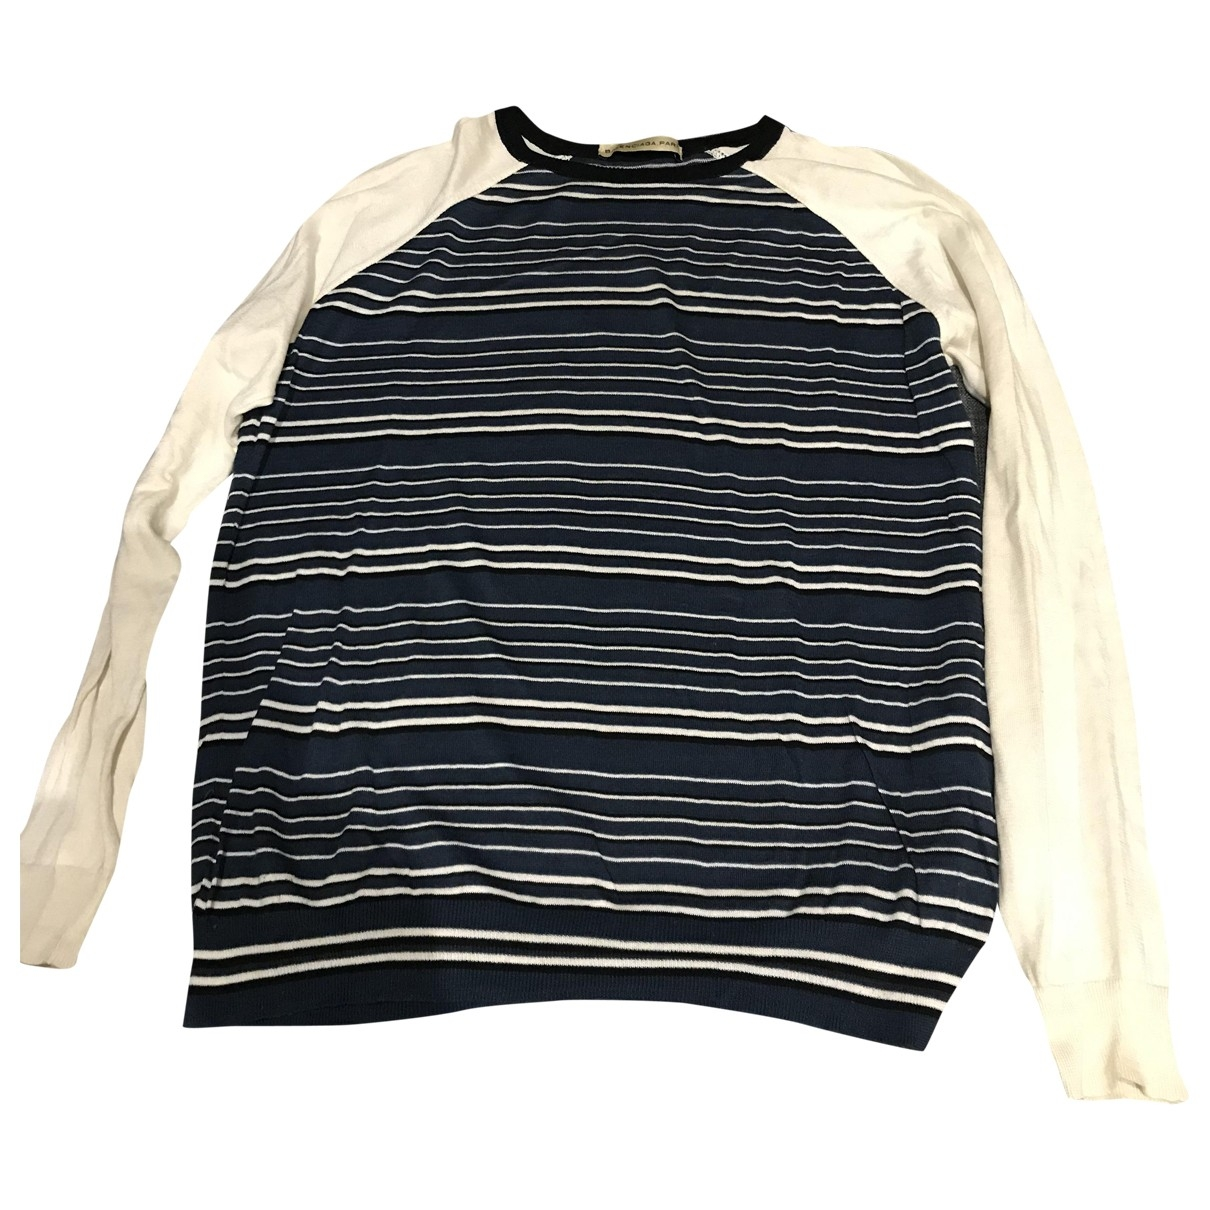 Balenciaga \N Blue Cotton Knitwear & Sweatshirts for Men S International